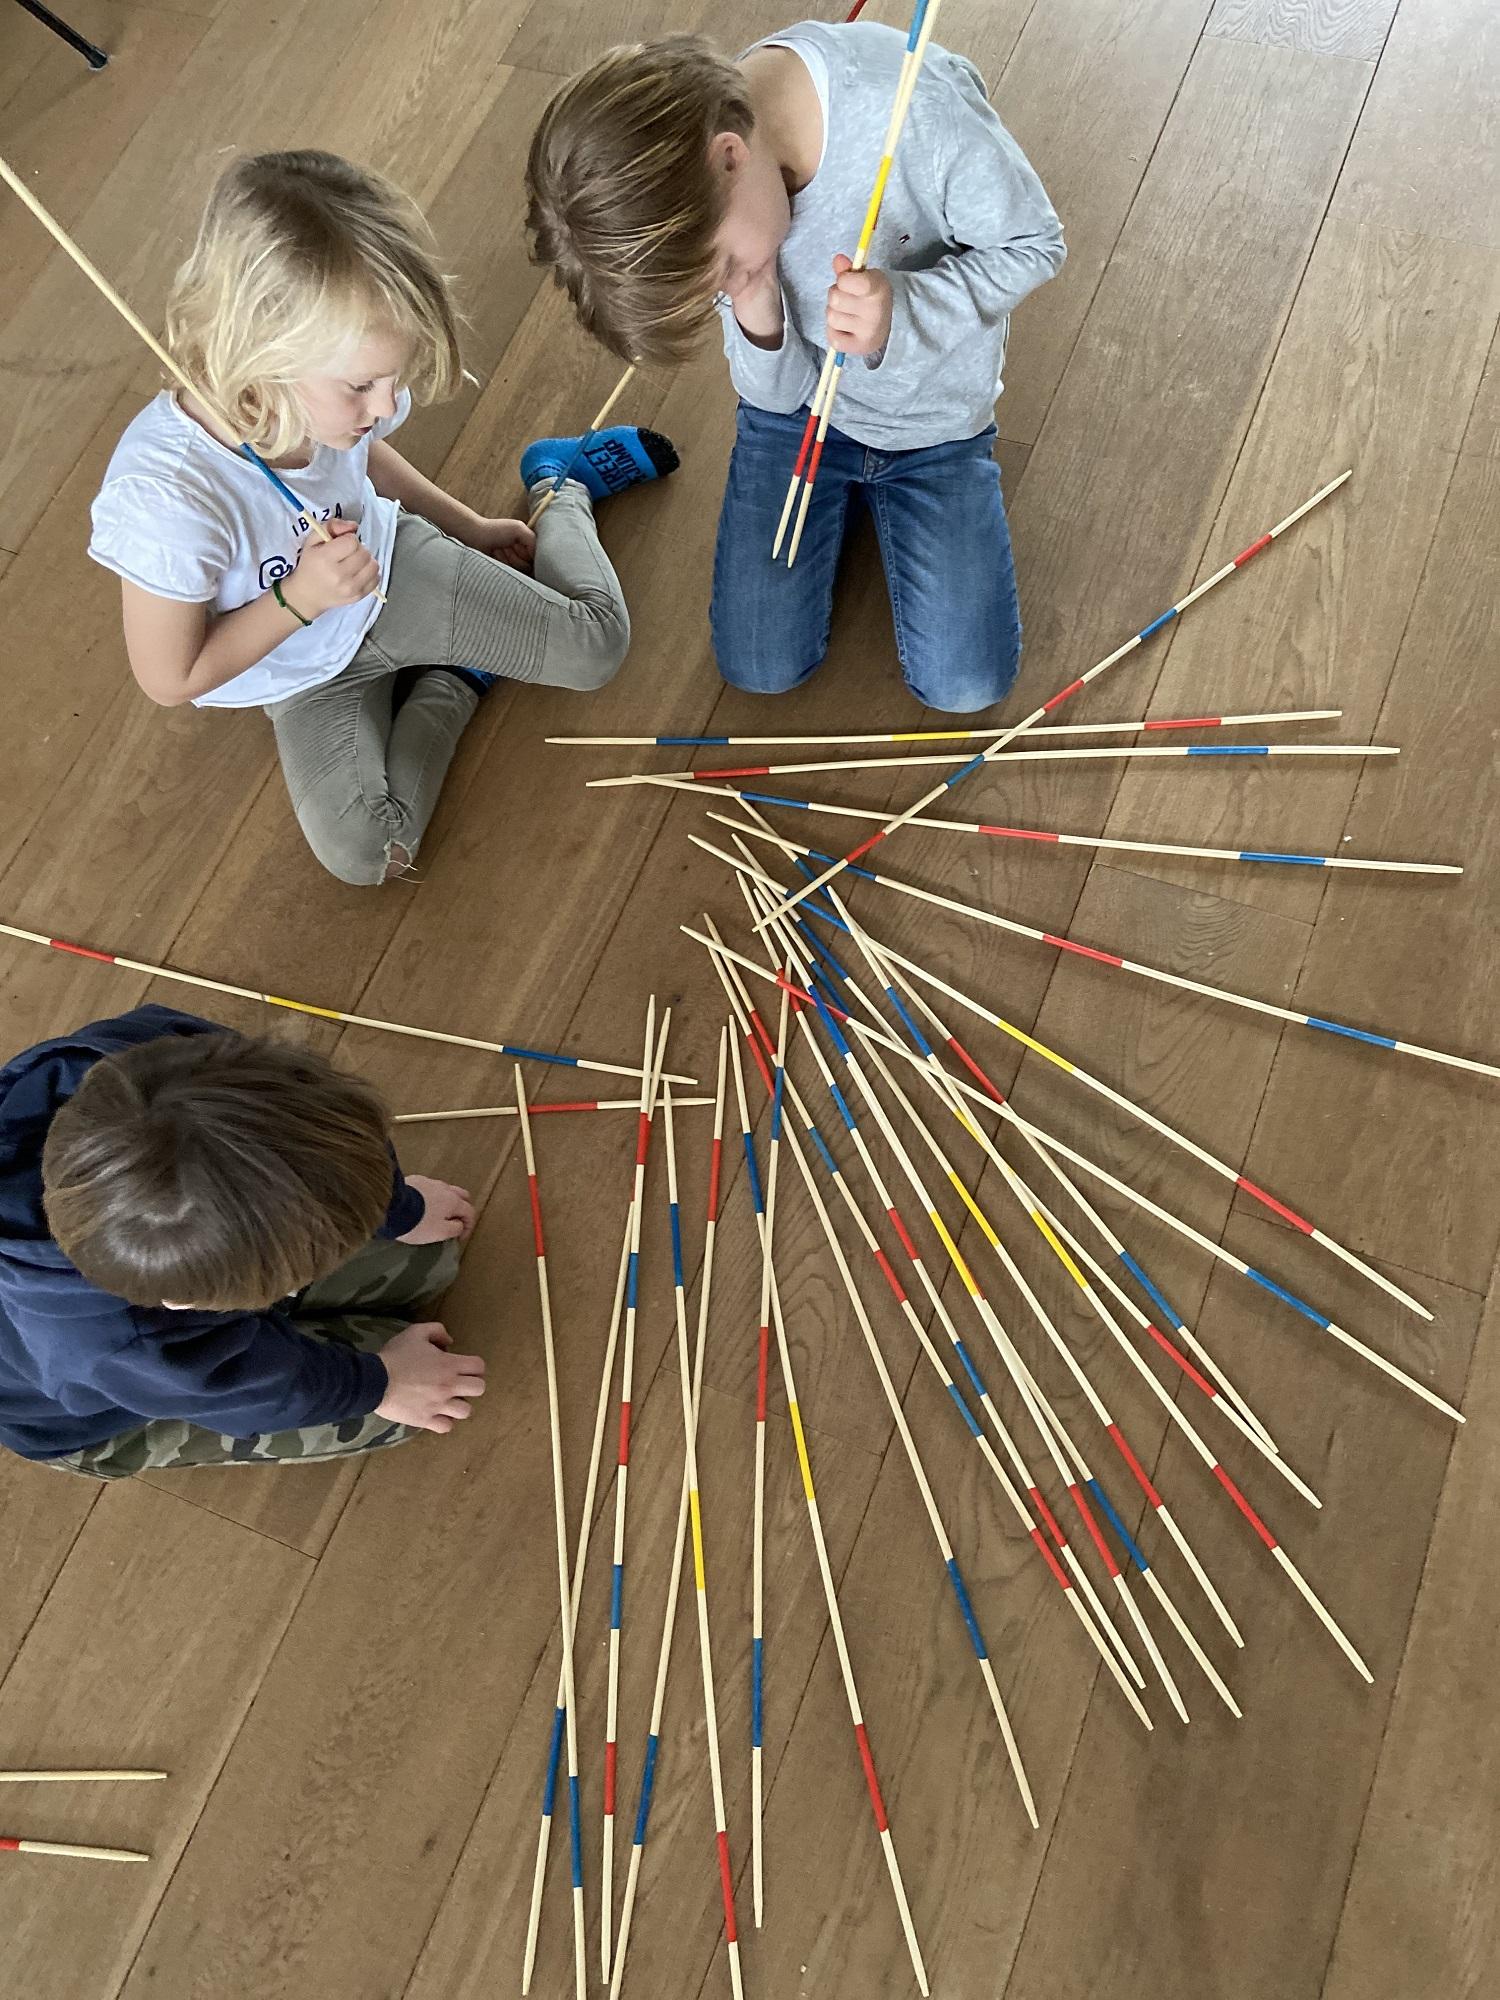 Kids Love Travel: Speelgoed in quarantaine tijden